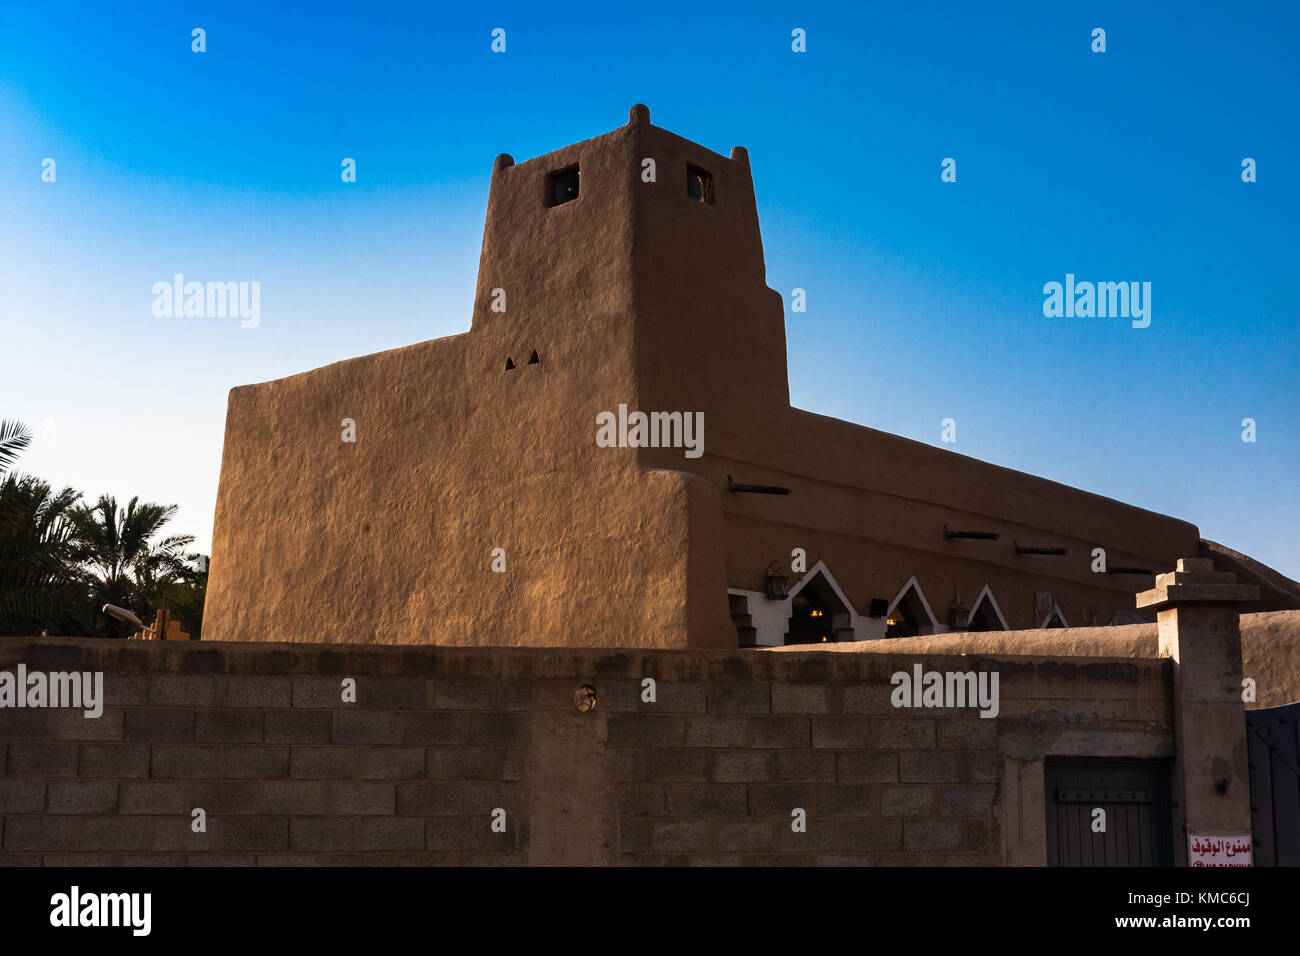 The Heritage Mosque, Ad Diriyah, Riyadh - Stock Image